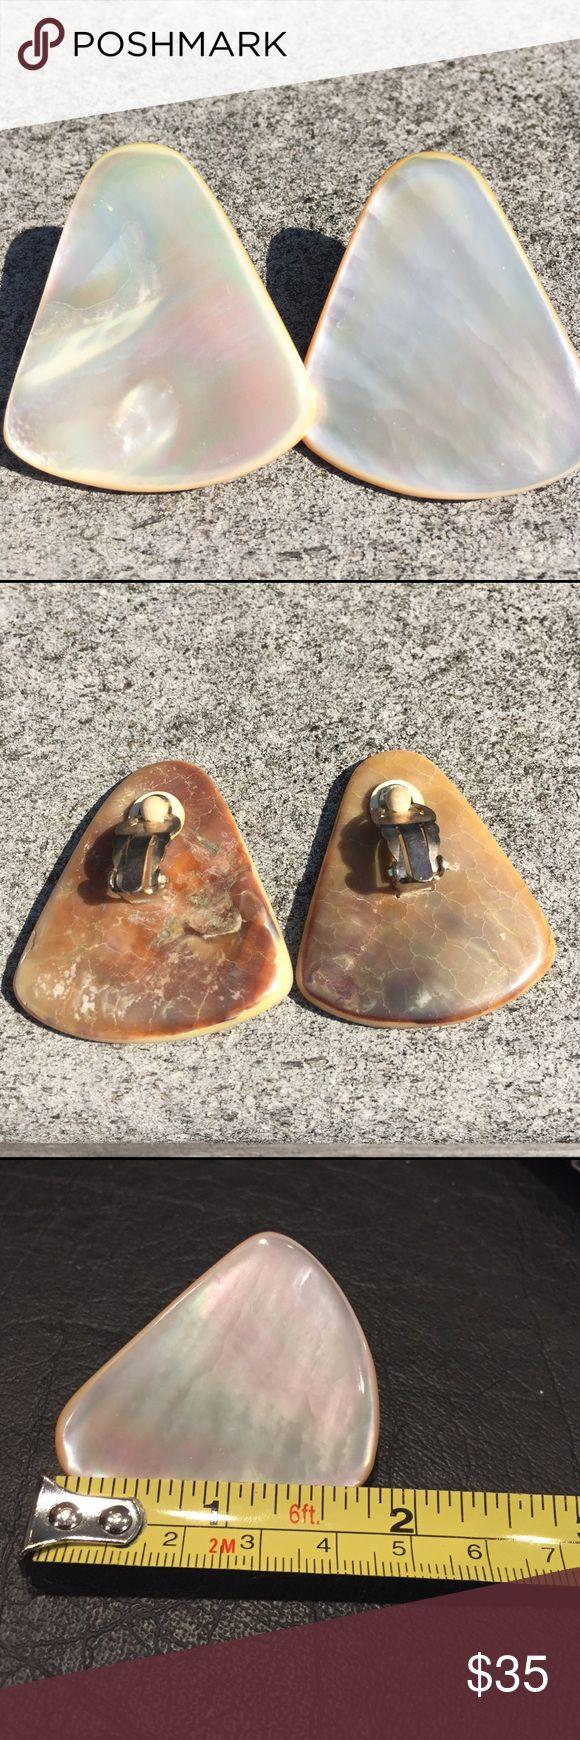 Vintage Mother Of Pearl Clip Earrings